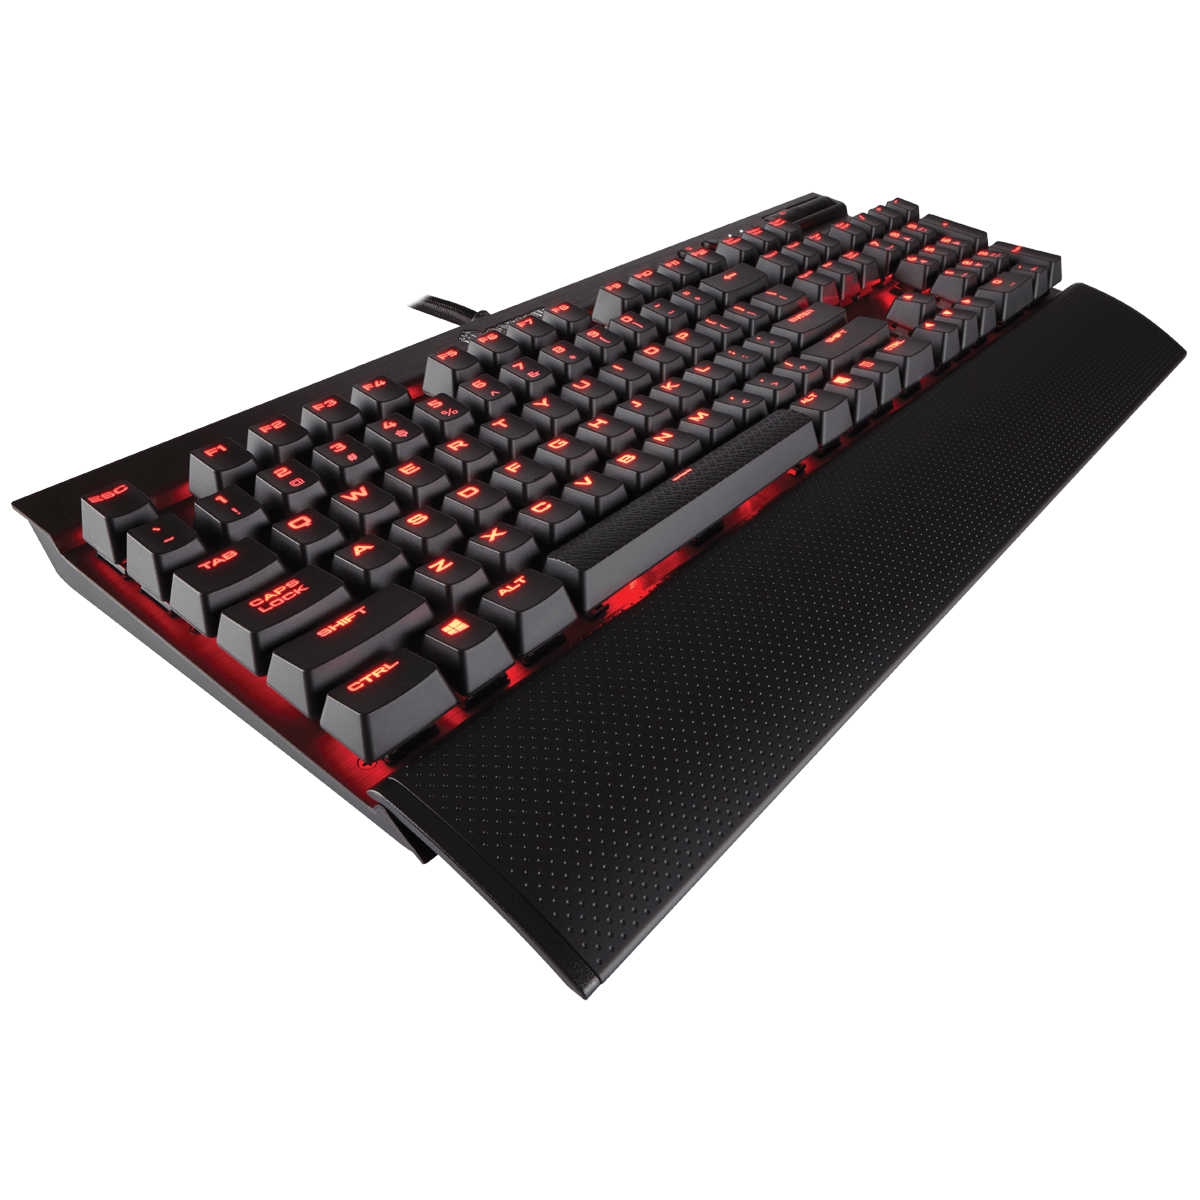 Teclado Corsair Gamer Mecânico Rapidfire K70, Switch Cherry MX Speed, CH-9101024-NA